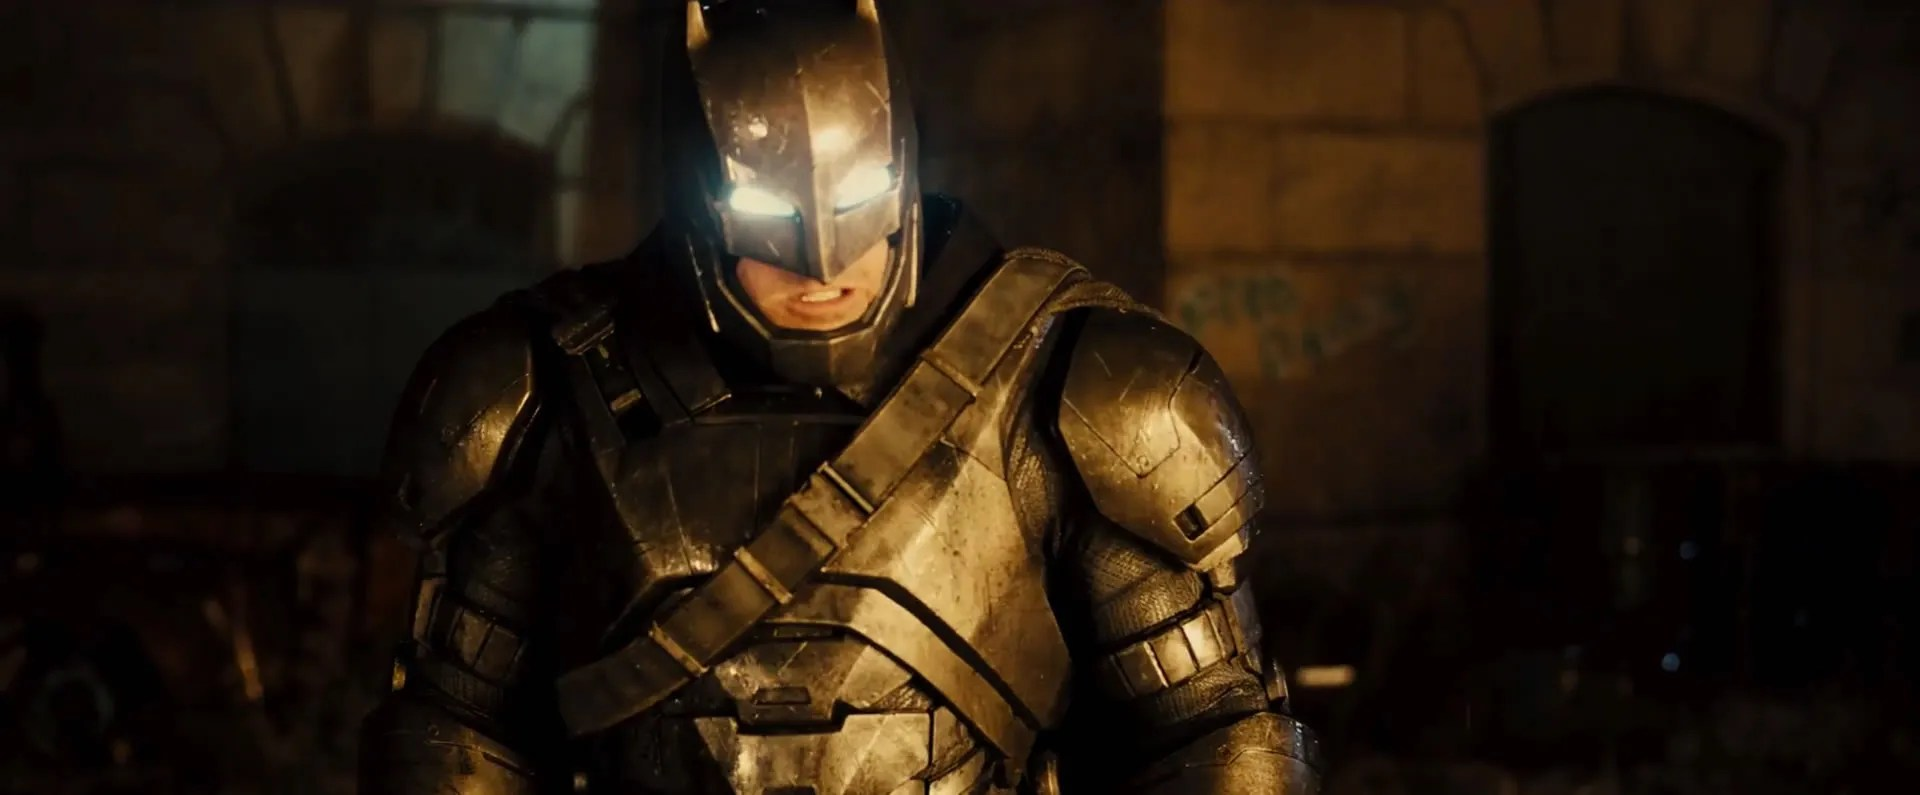 Batman Vs Superman New Trailer, Dark Knight Footage